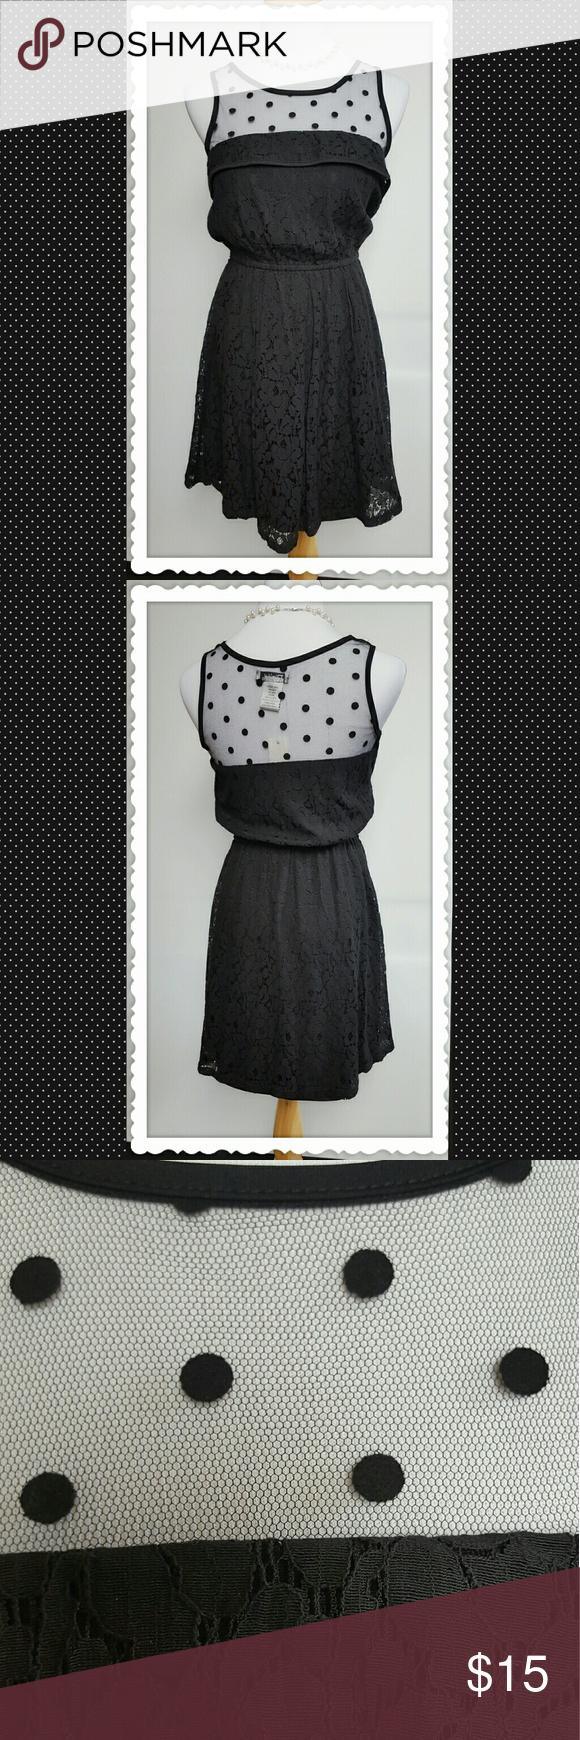 Pinky Black Dress With Sheer Top Black Dress Clothes Design Dresses [ 1740 x 580 Pixel ]